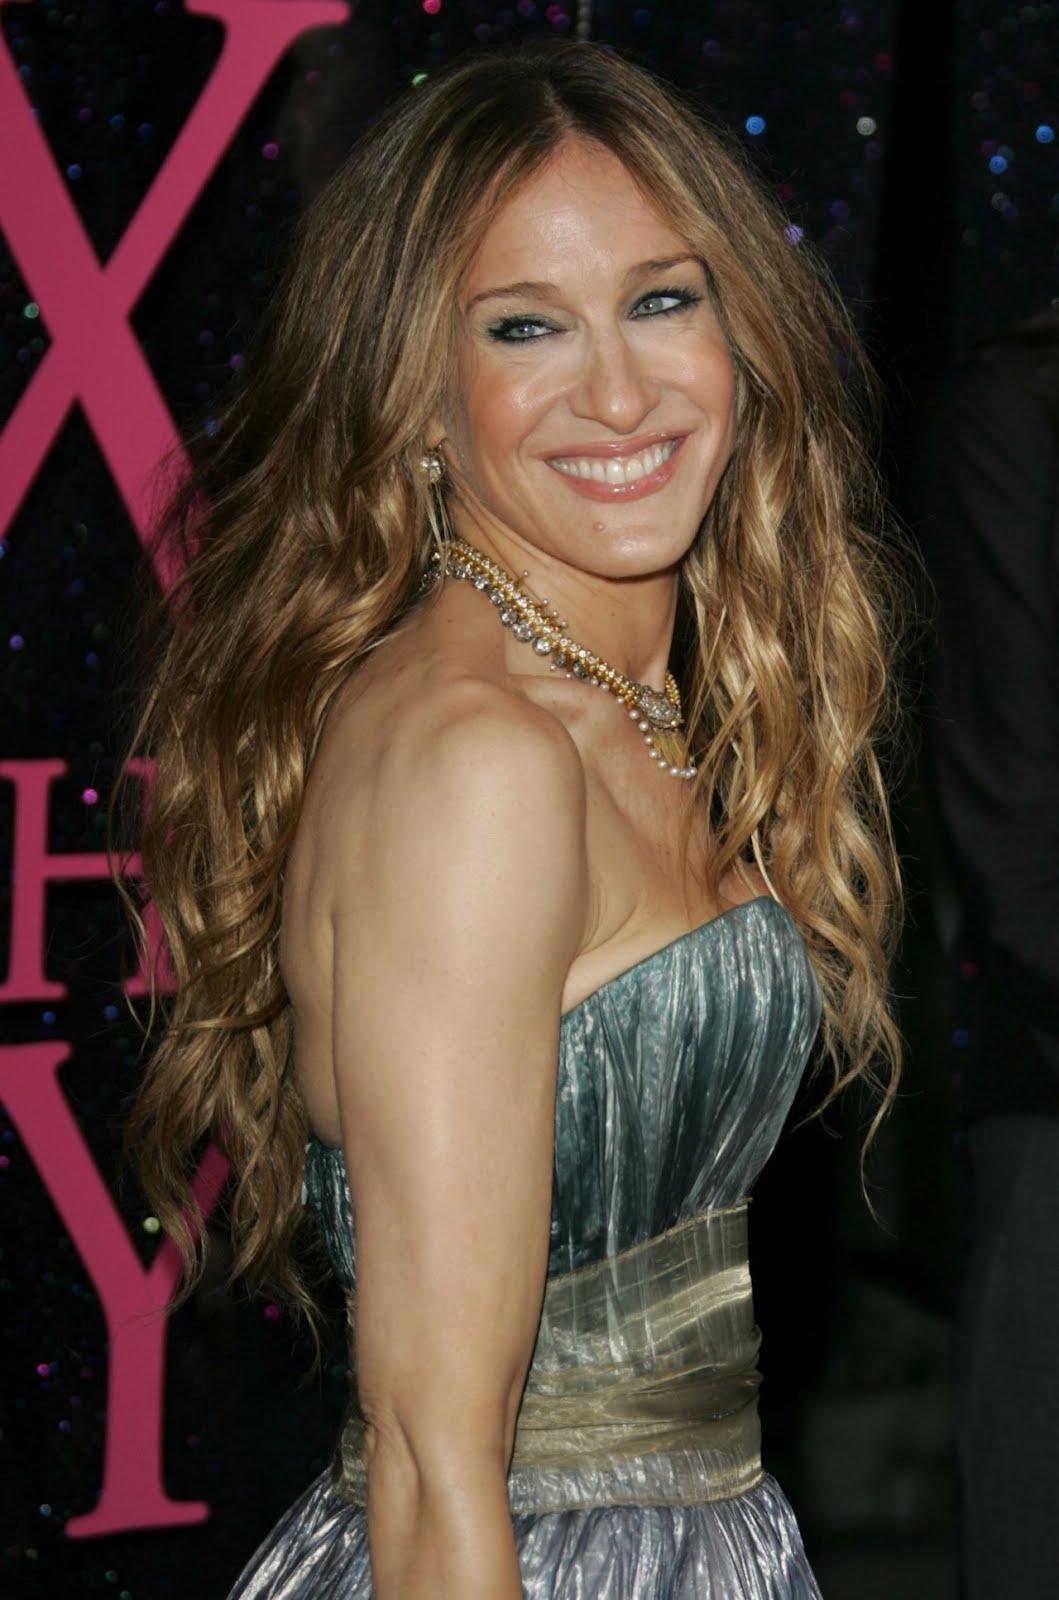 http://1.bp.blogspot.com/-WpoZtcuVjyc/TxjVK6DbLAI/AAAAAAAAB8E/8uhRZ2LPGUI/s1600/Sarah-Jessica-Parker-1154447.jpg